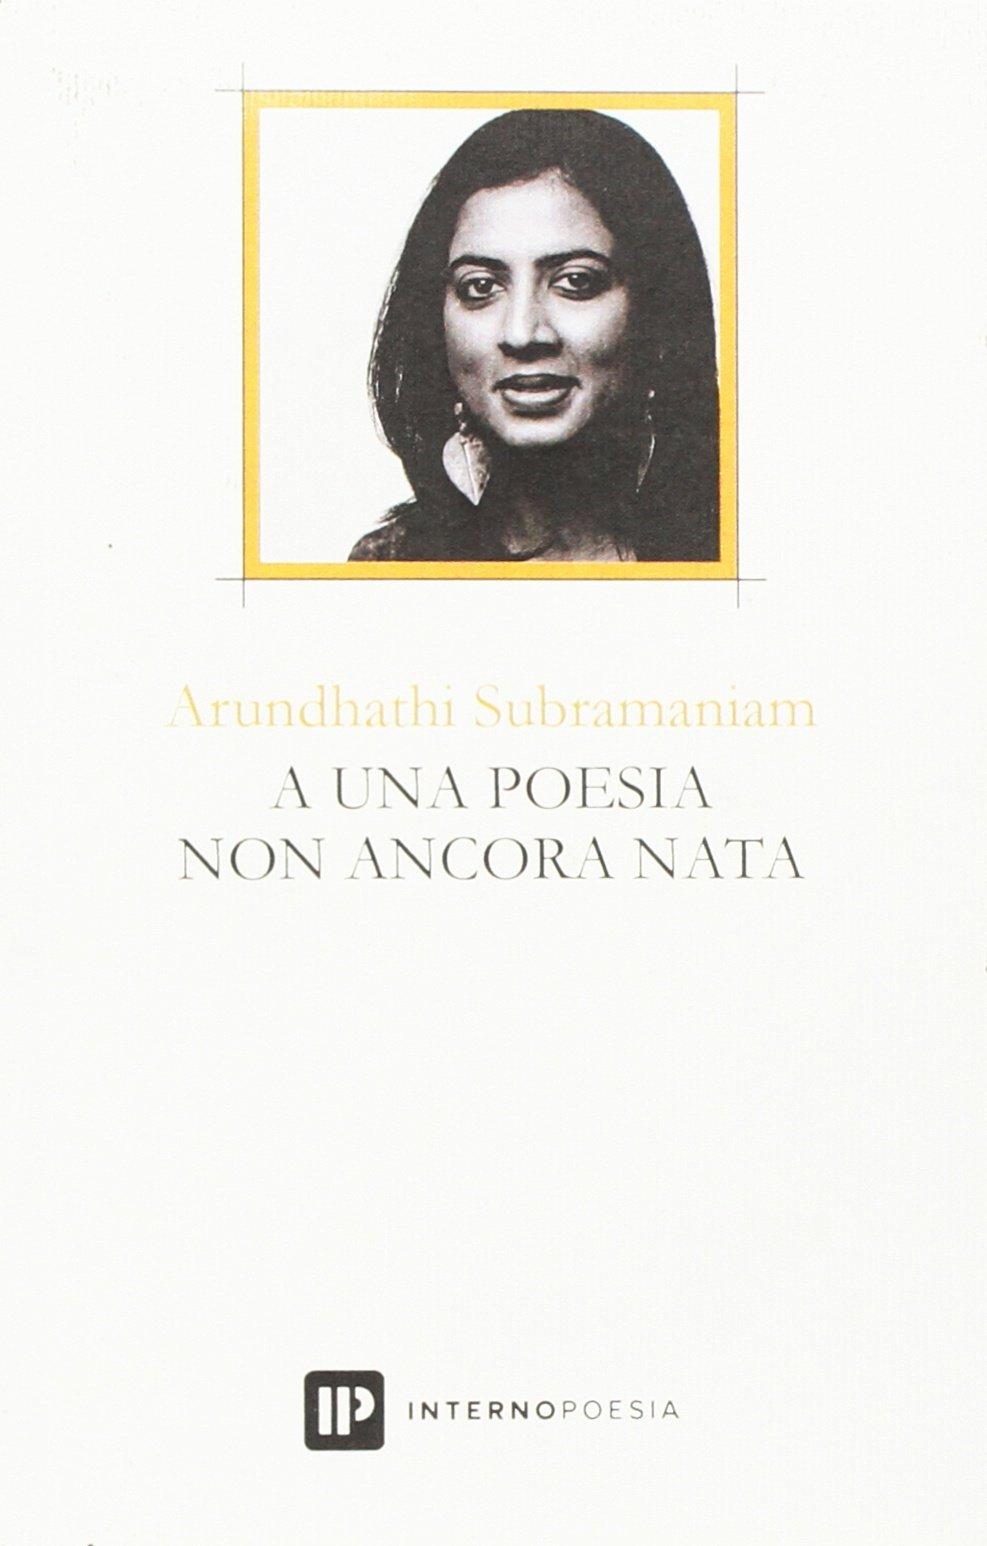 Arundhathi Subramaniam – A una poesia non ancora nata – Interno poesia